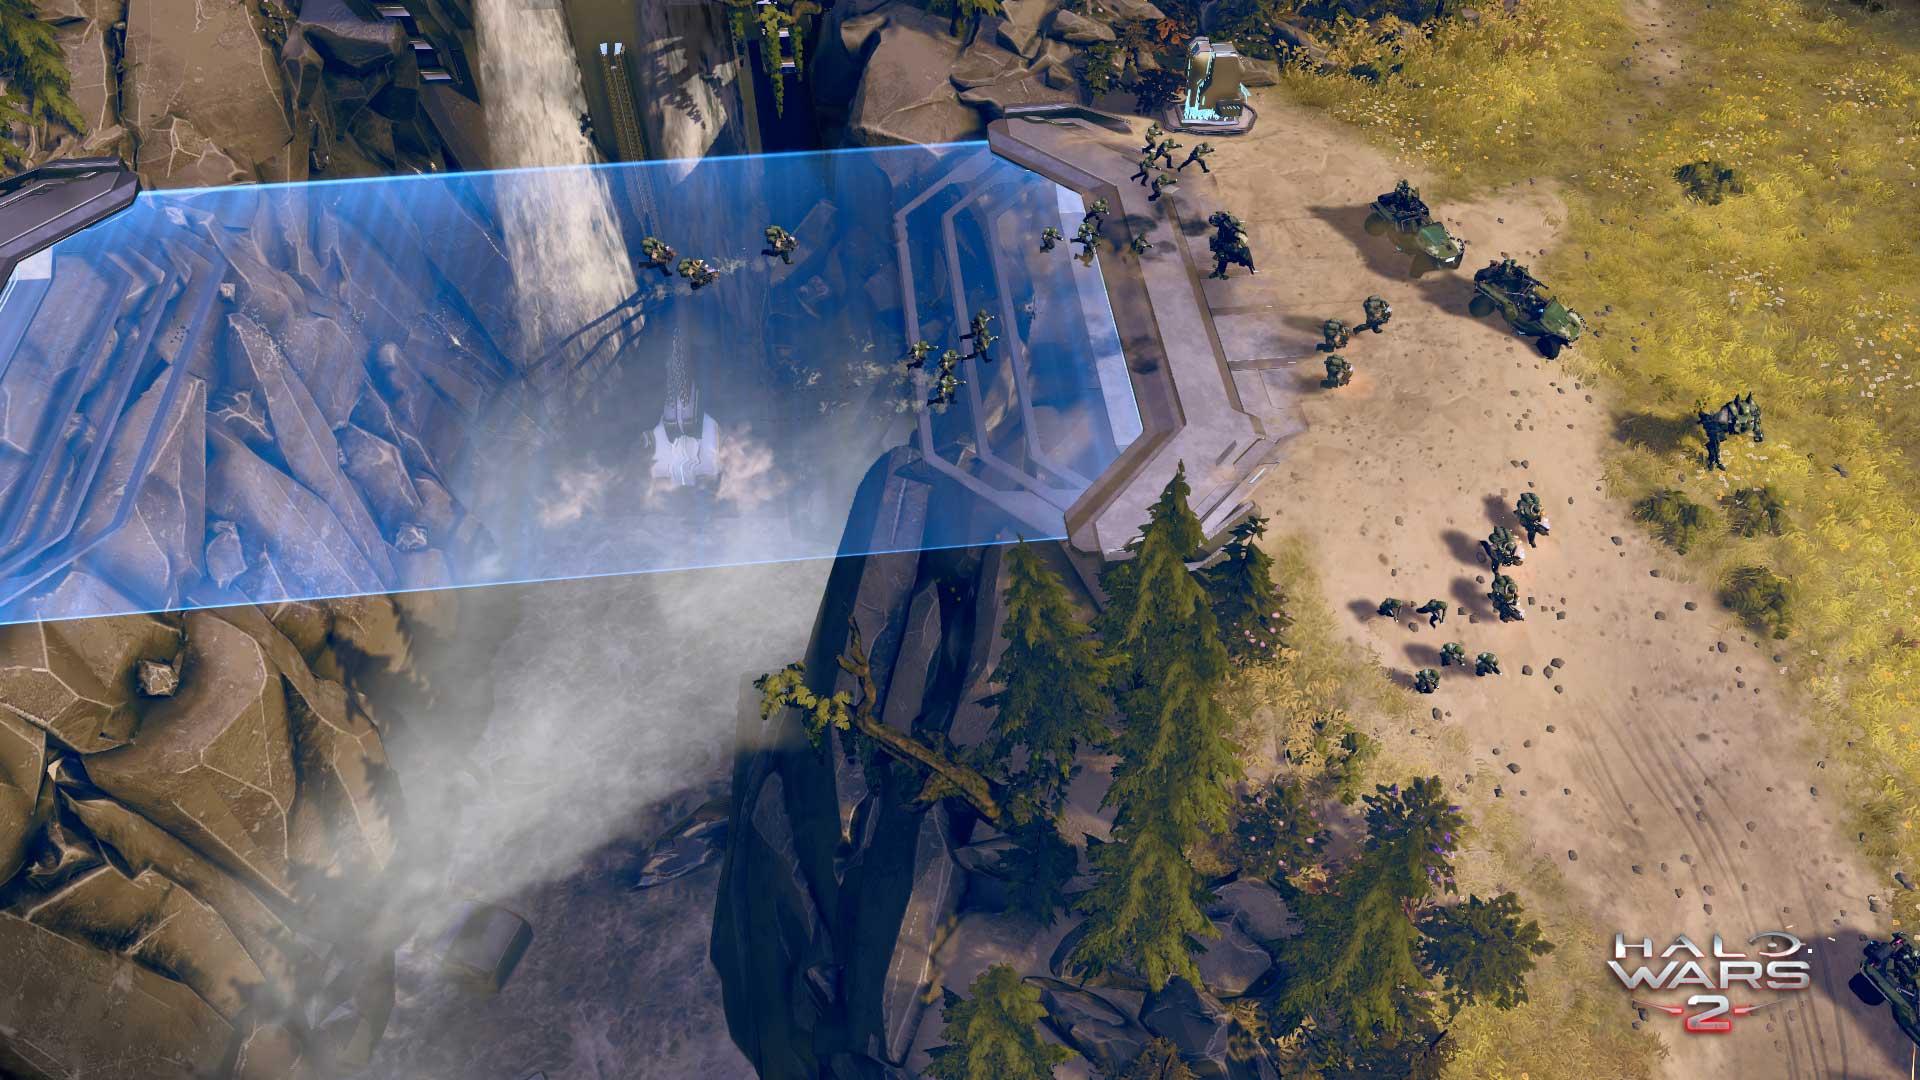 Bridge in Halo Wars 2